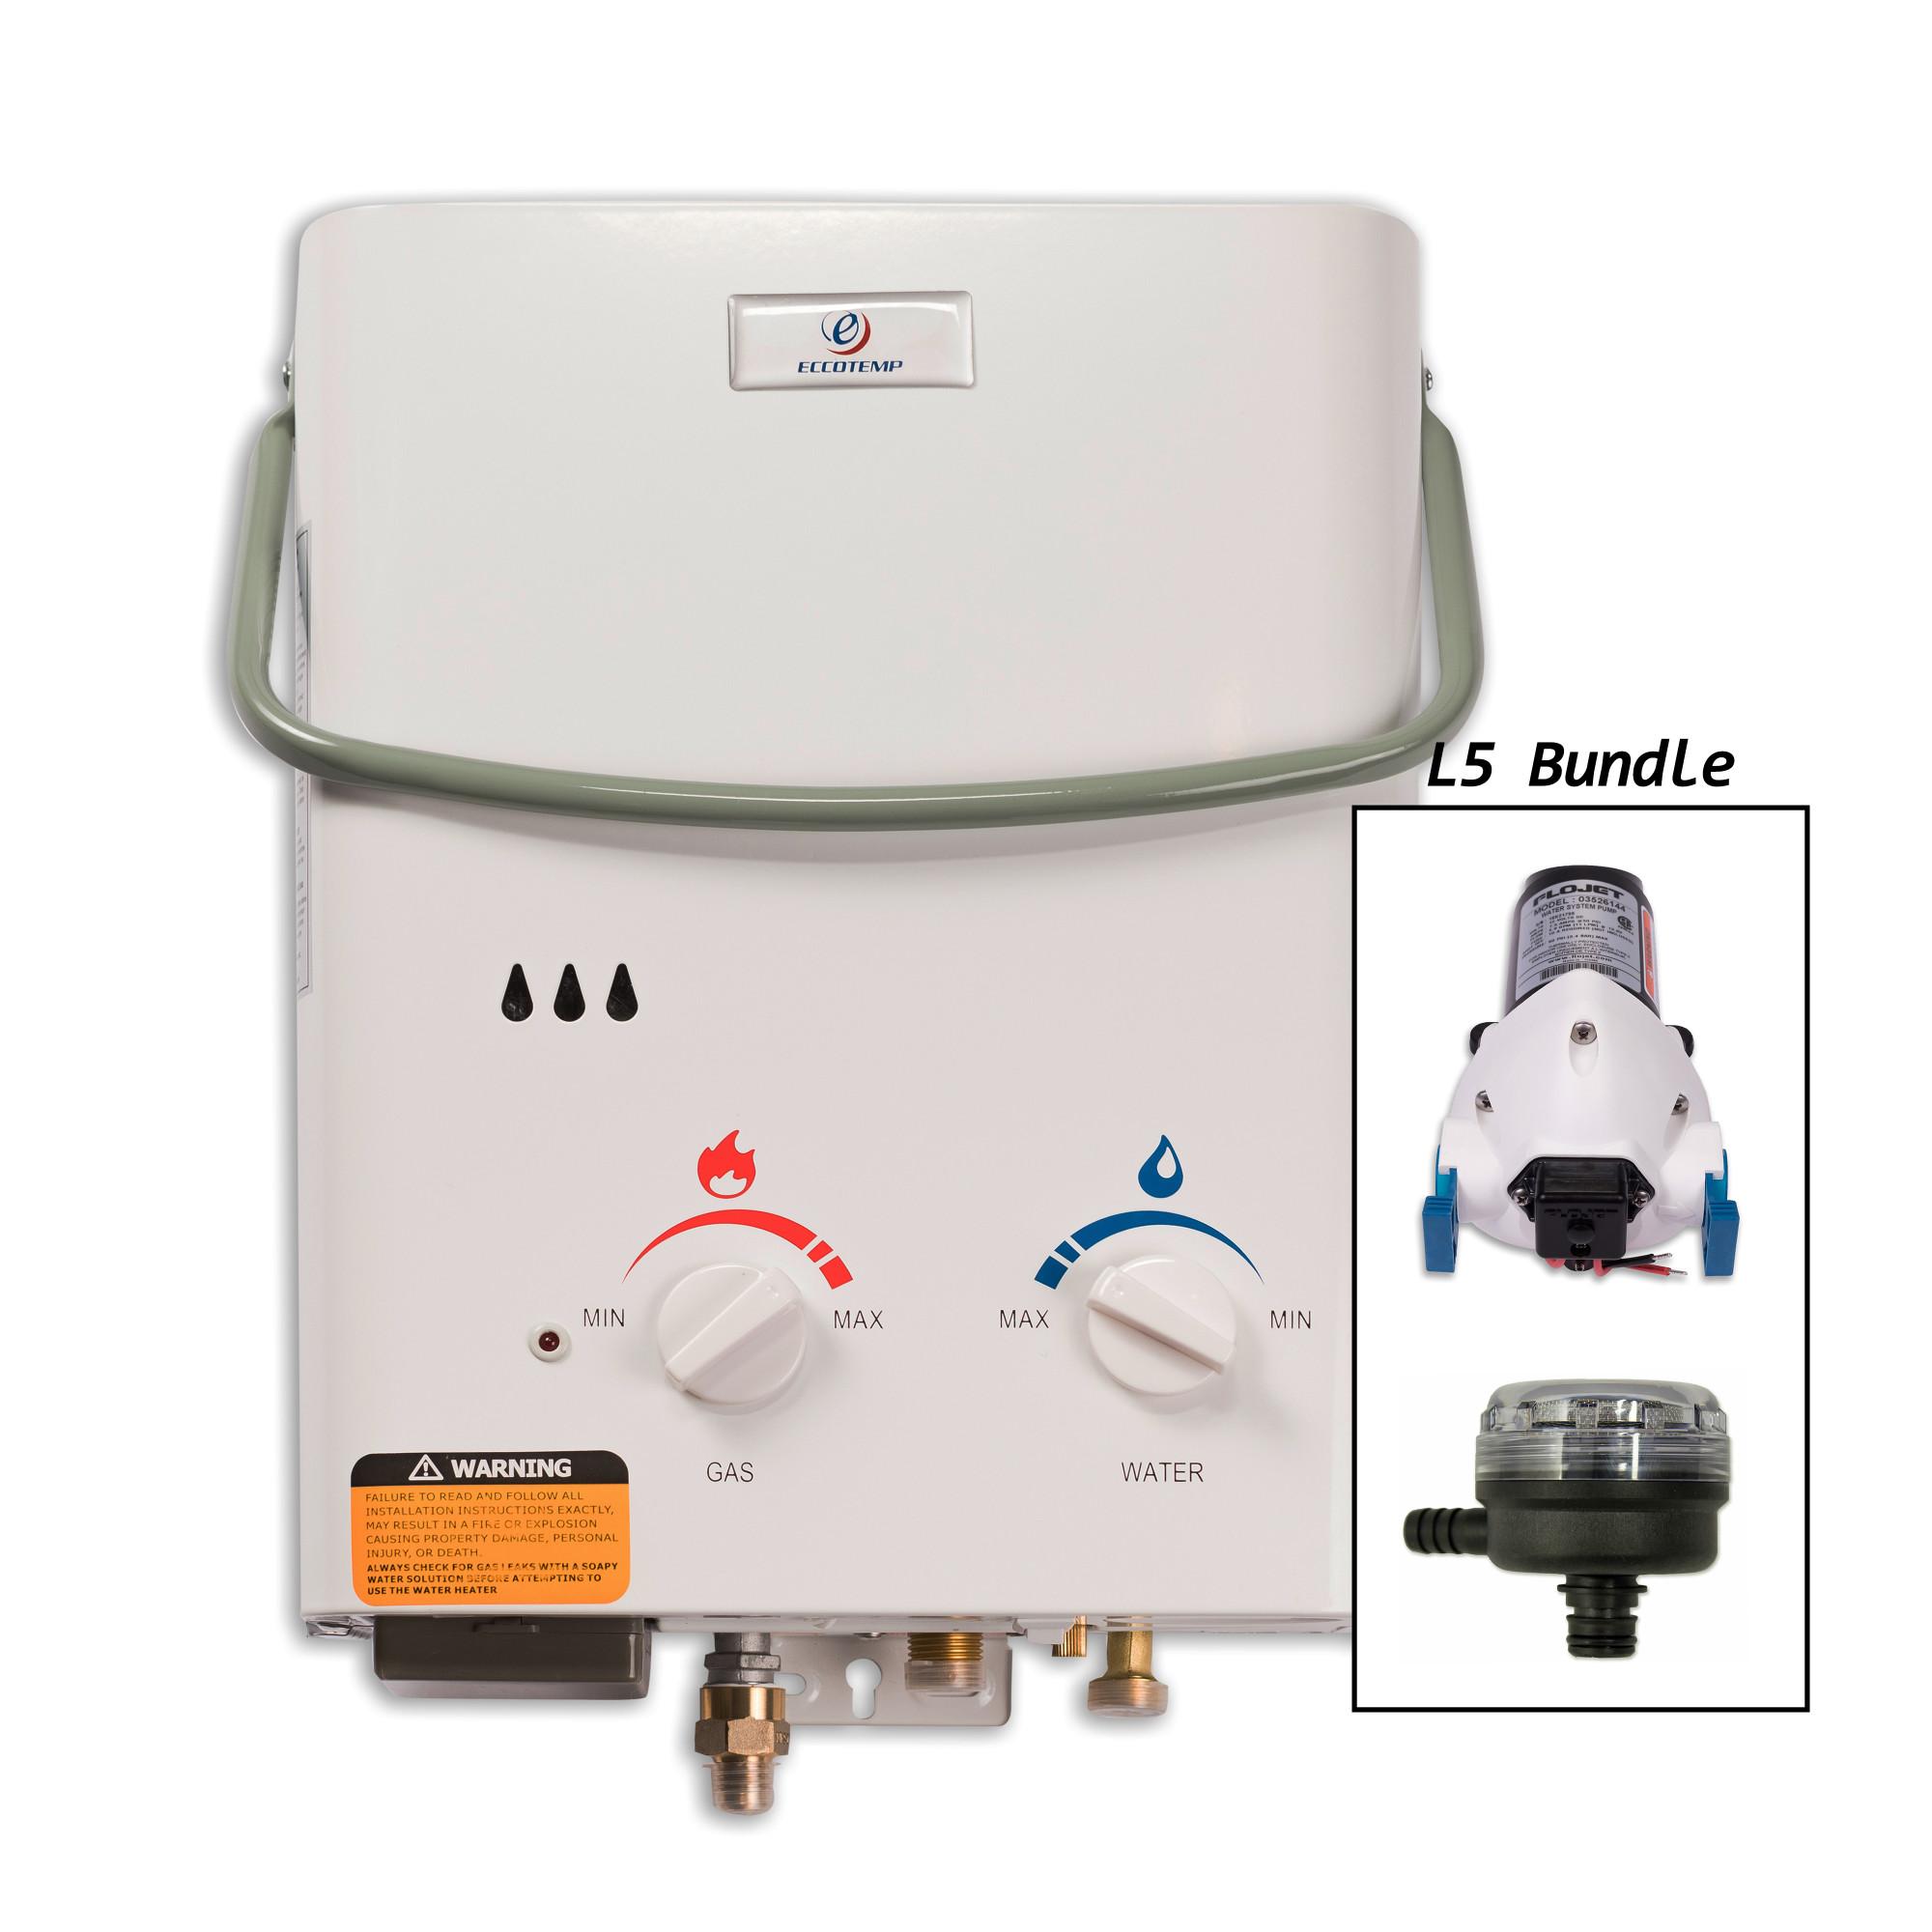 Eccotemp L5-PS 1.5 Gallon 11 Kilowatt Portable Liquid Propane Tankless Water Hea